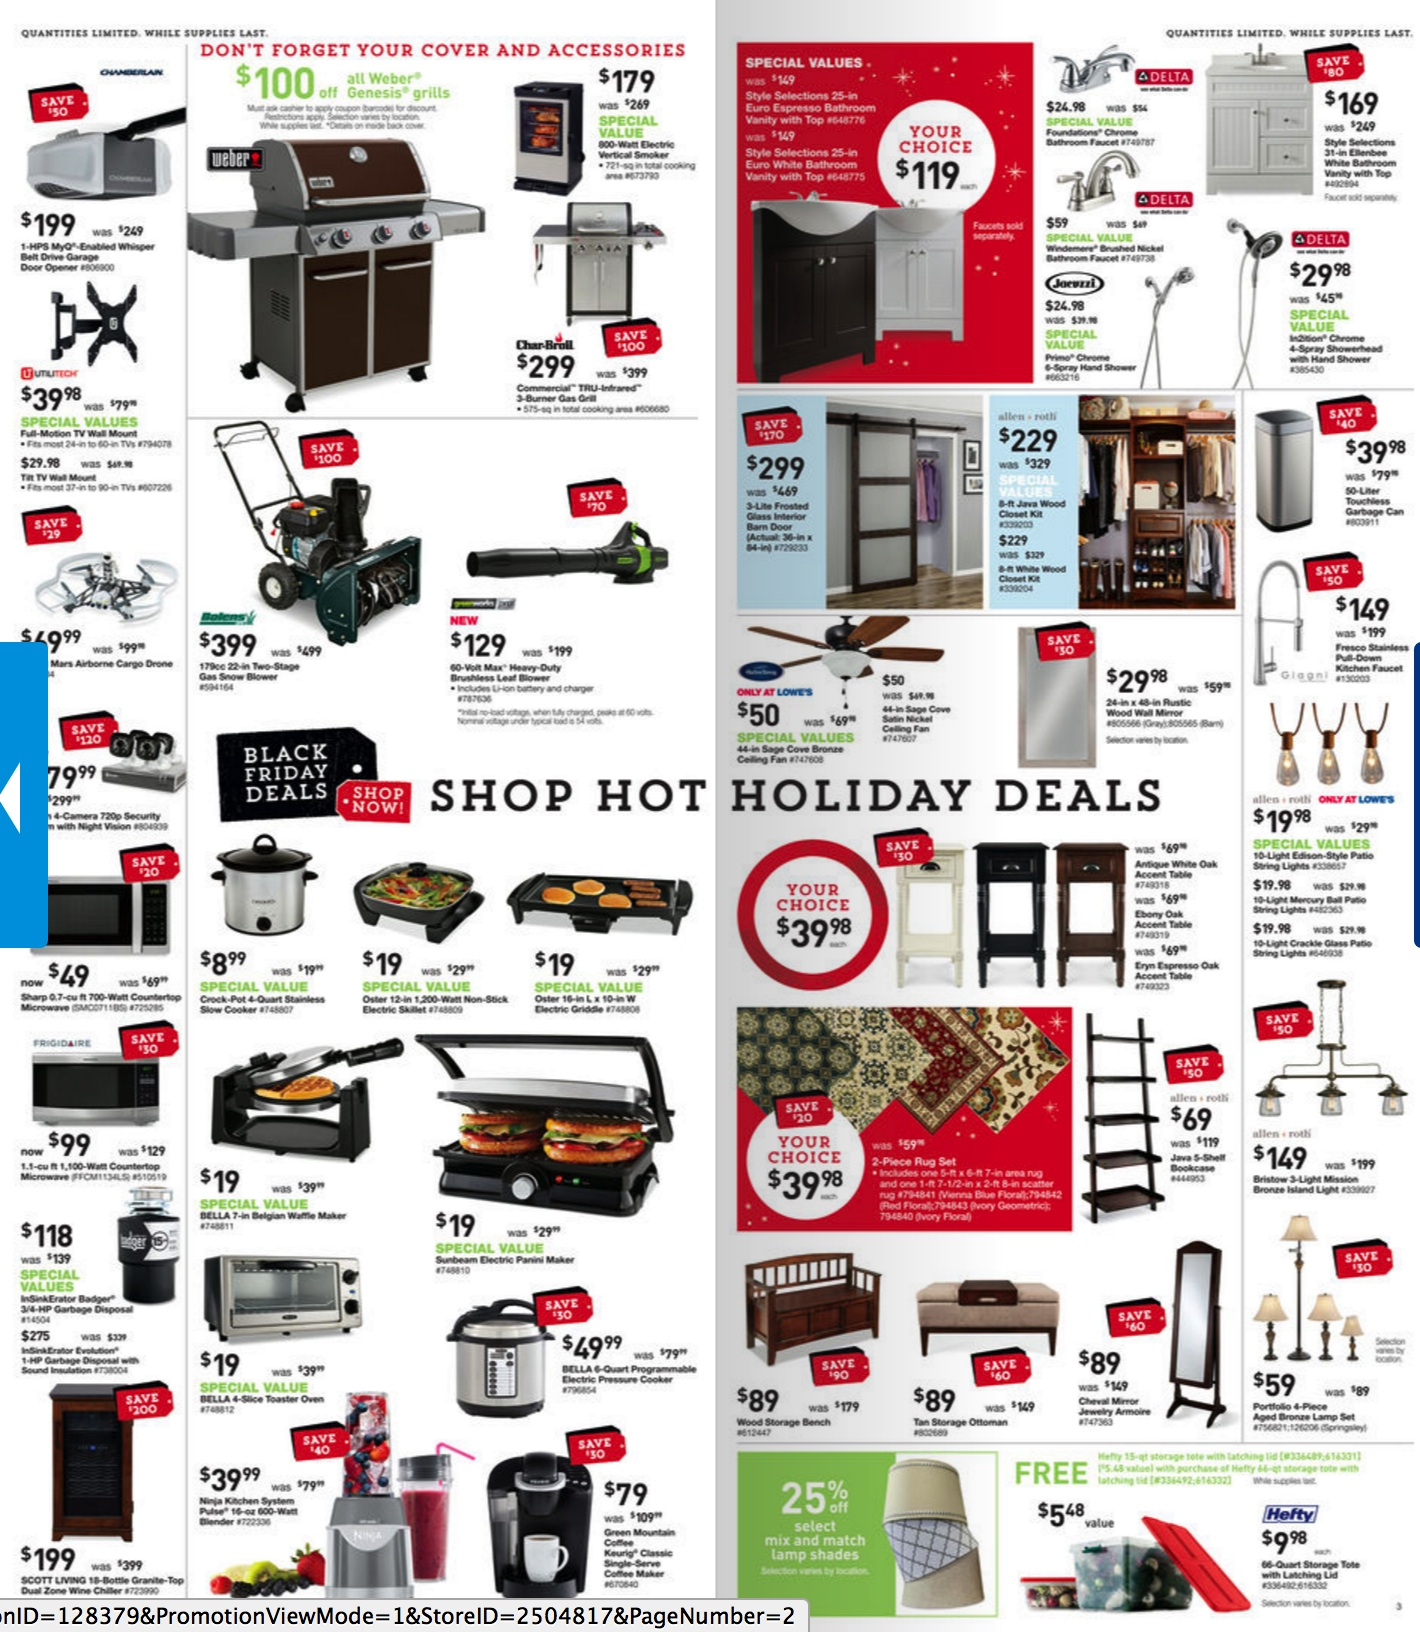 lowe s black friday ad deals 2017 funtober. Black Bedroom Furniture Sets. Home Design Ideas